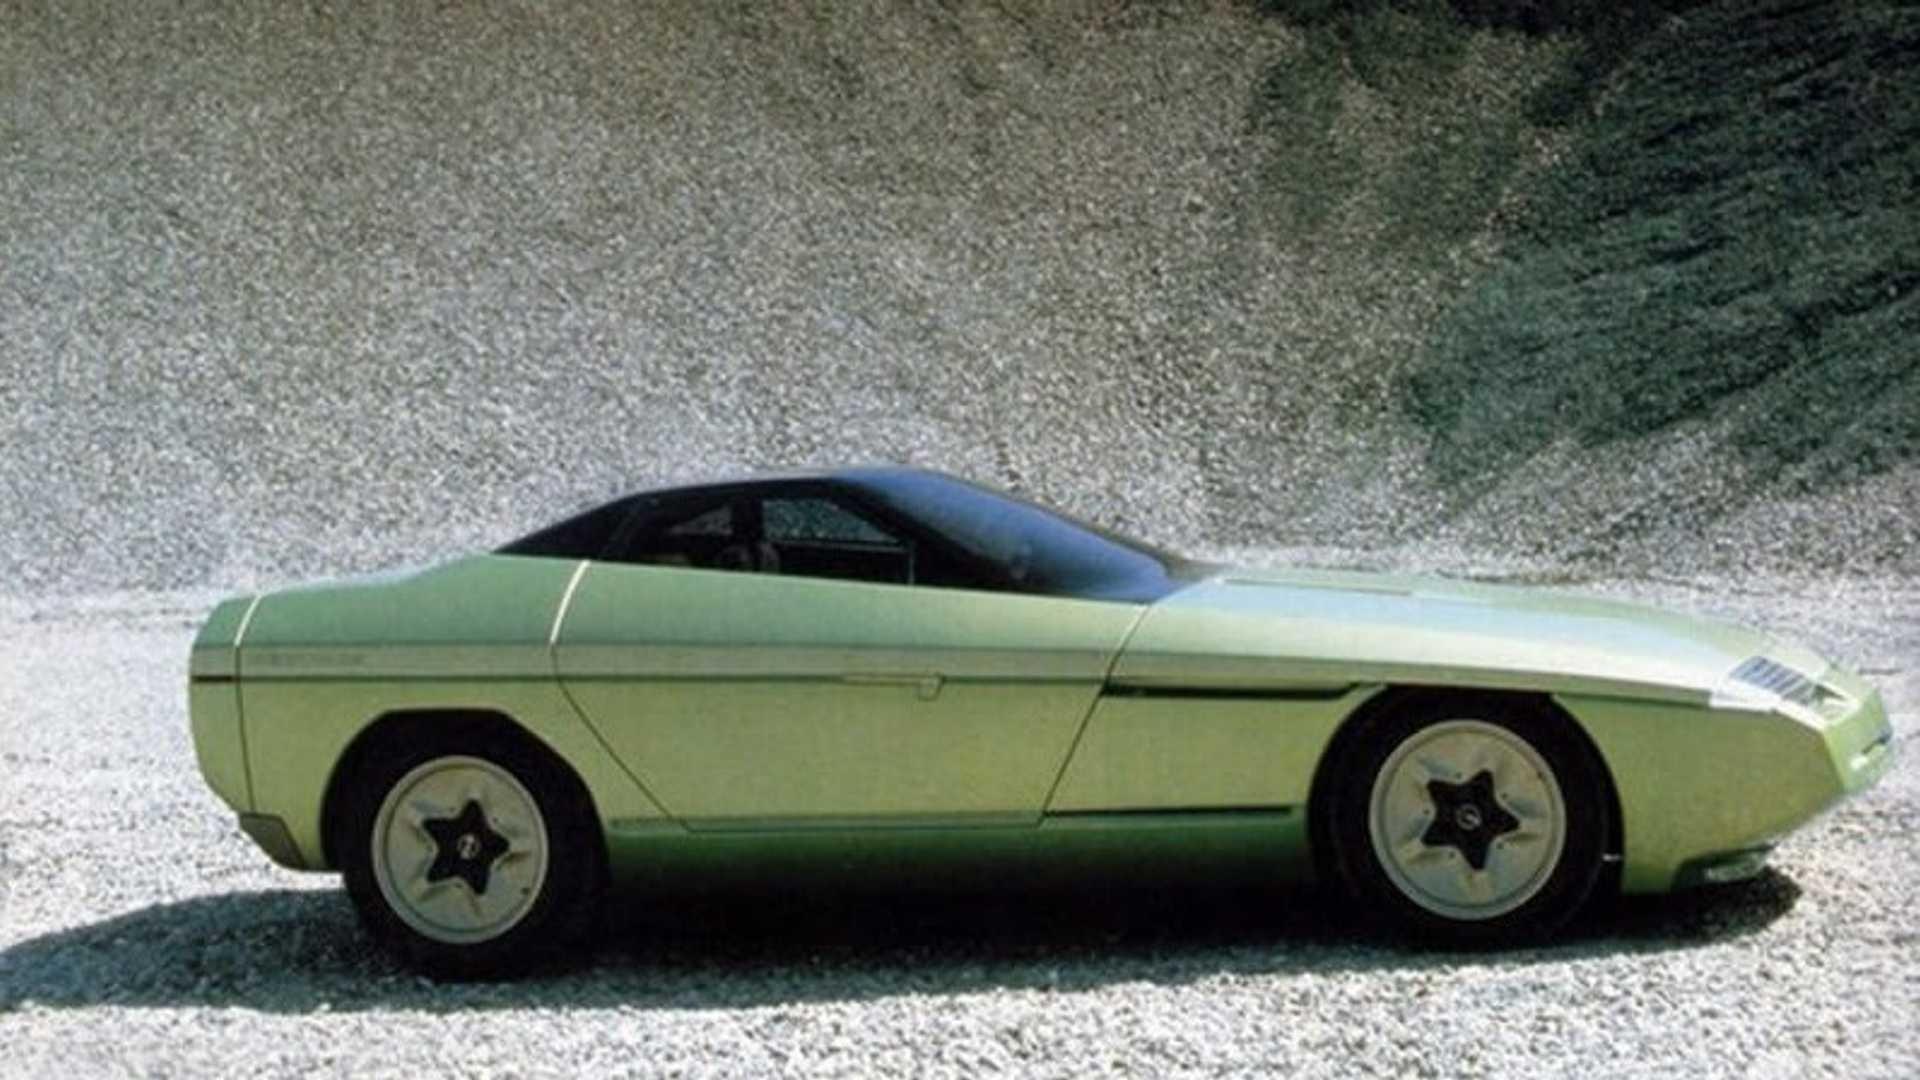 1984 Chevrolet Corvette Ramarro